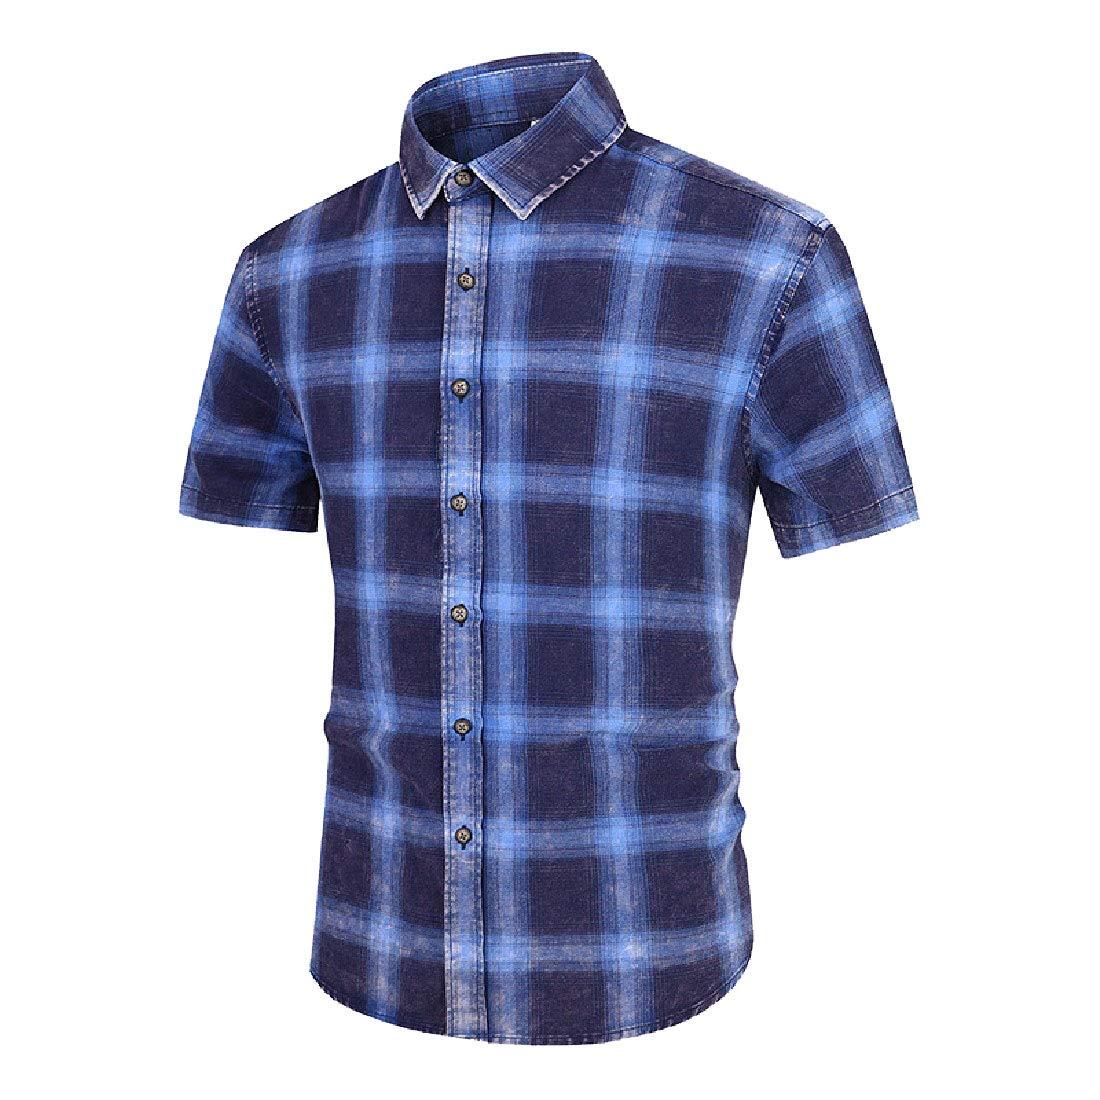 SportsX Mens Casual Plaid Button Down Short Sleeves Cotton Work Shirt